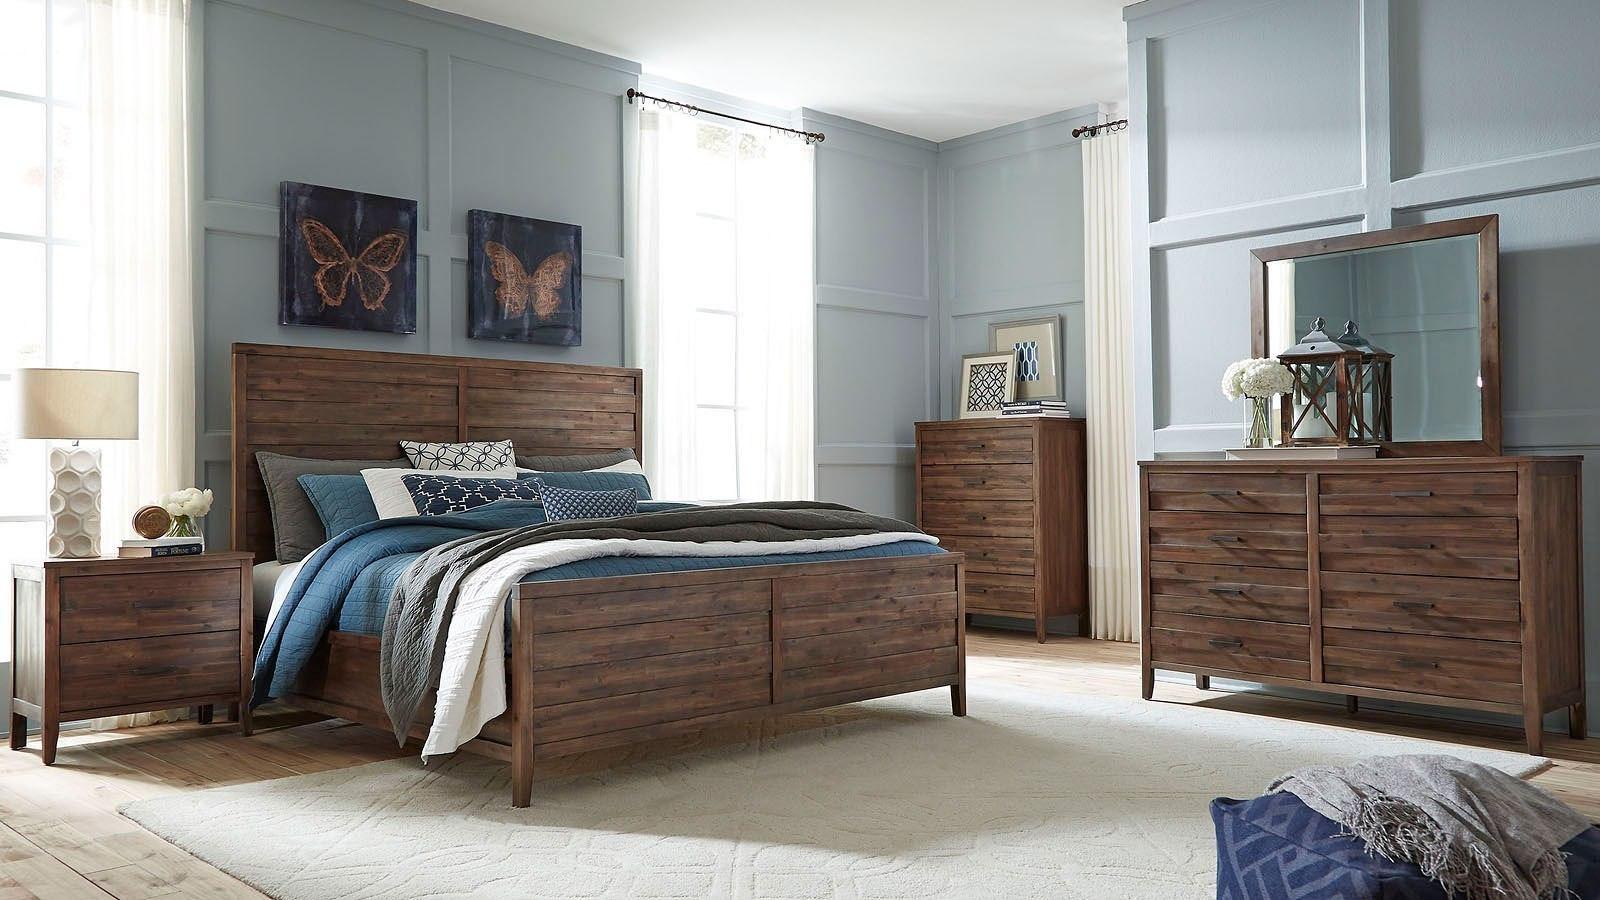 cresswell panel bedroom set standard furniture furniture cart. Black Bedroom Furniture Sets. Home Design Ideas